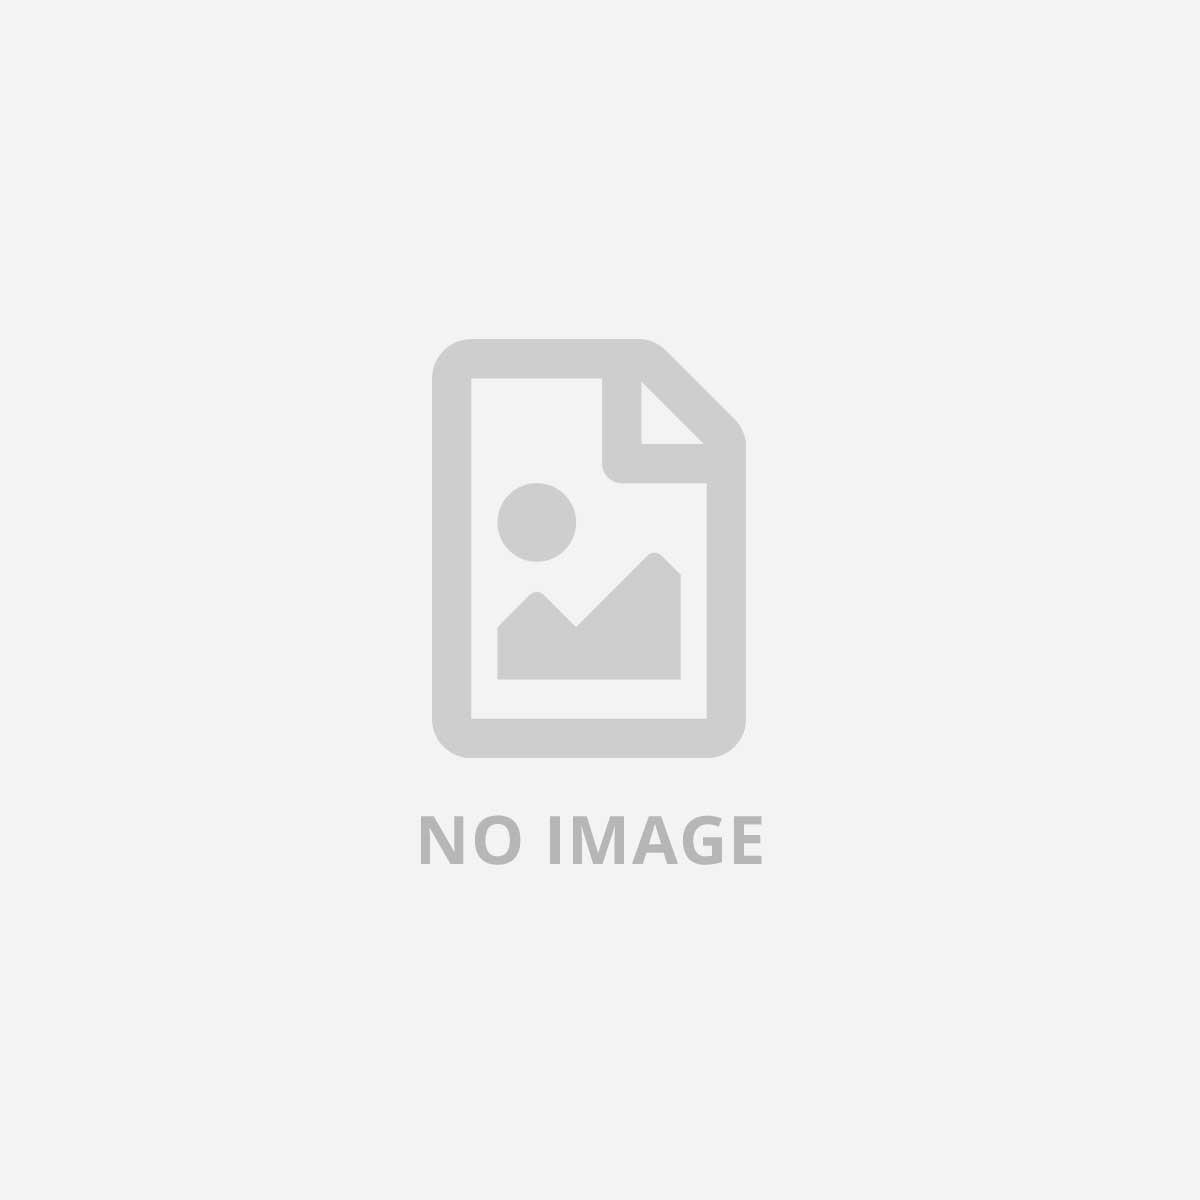 NILOX EVO 360